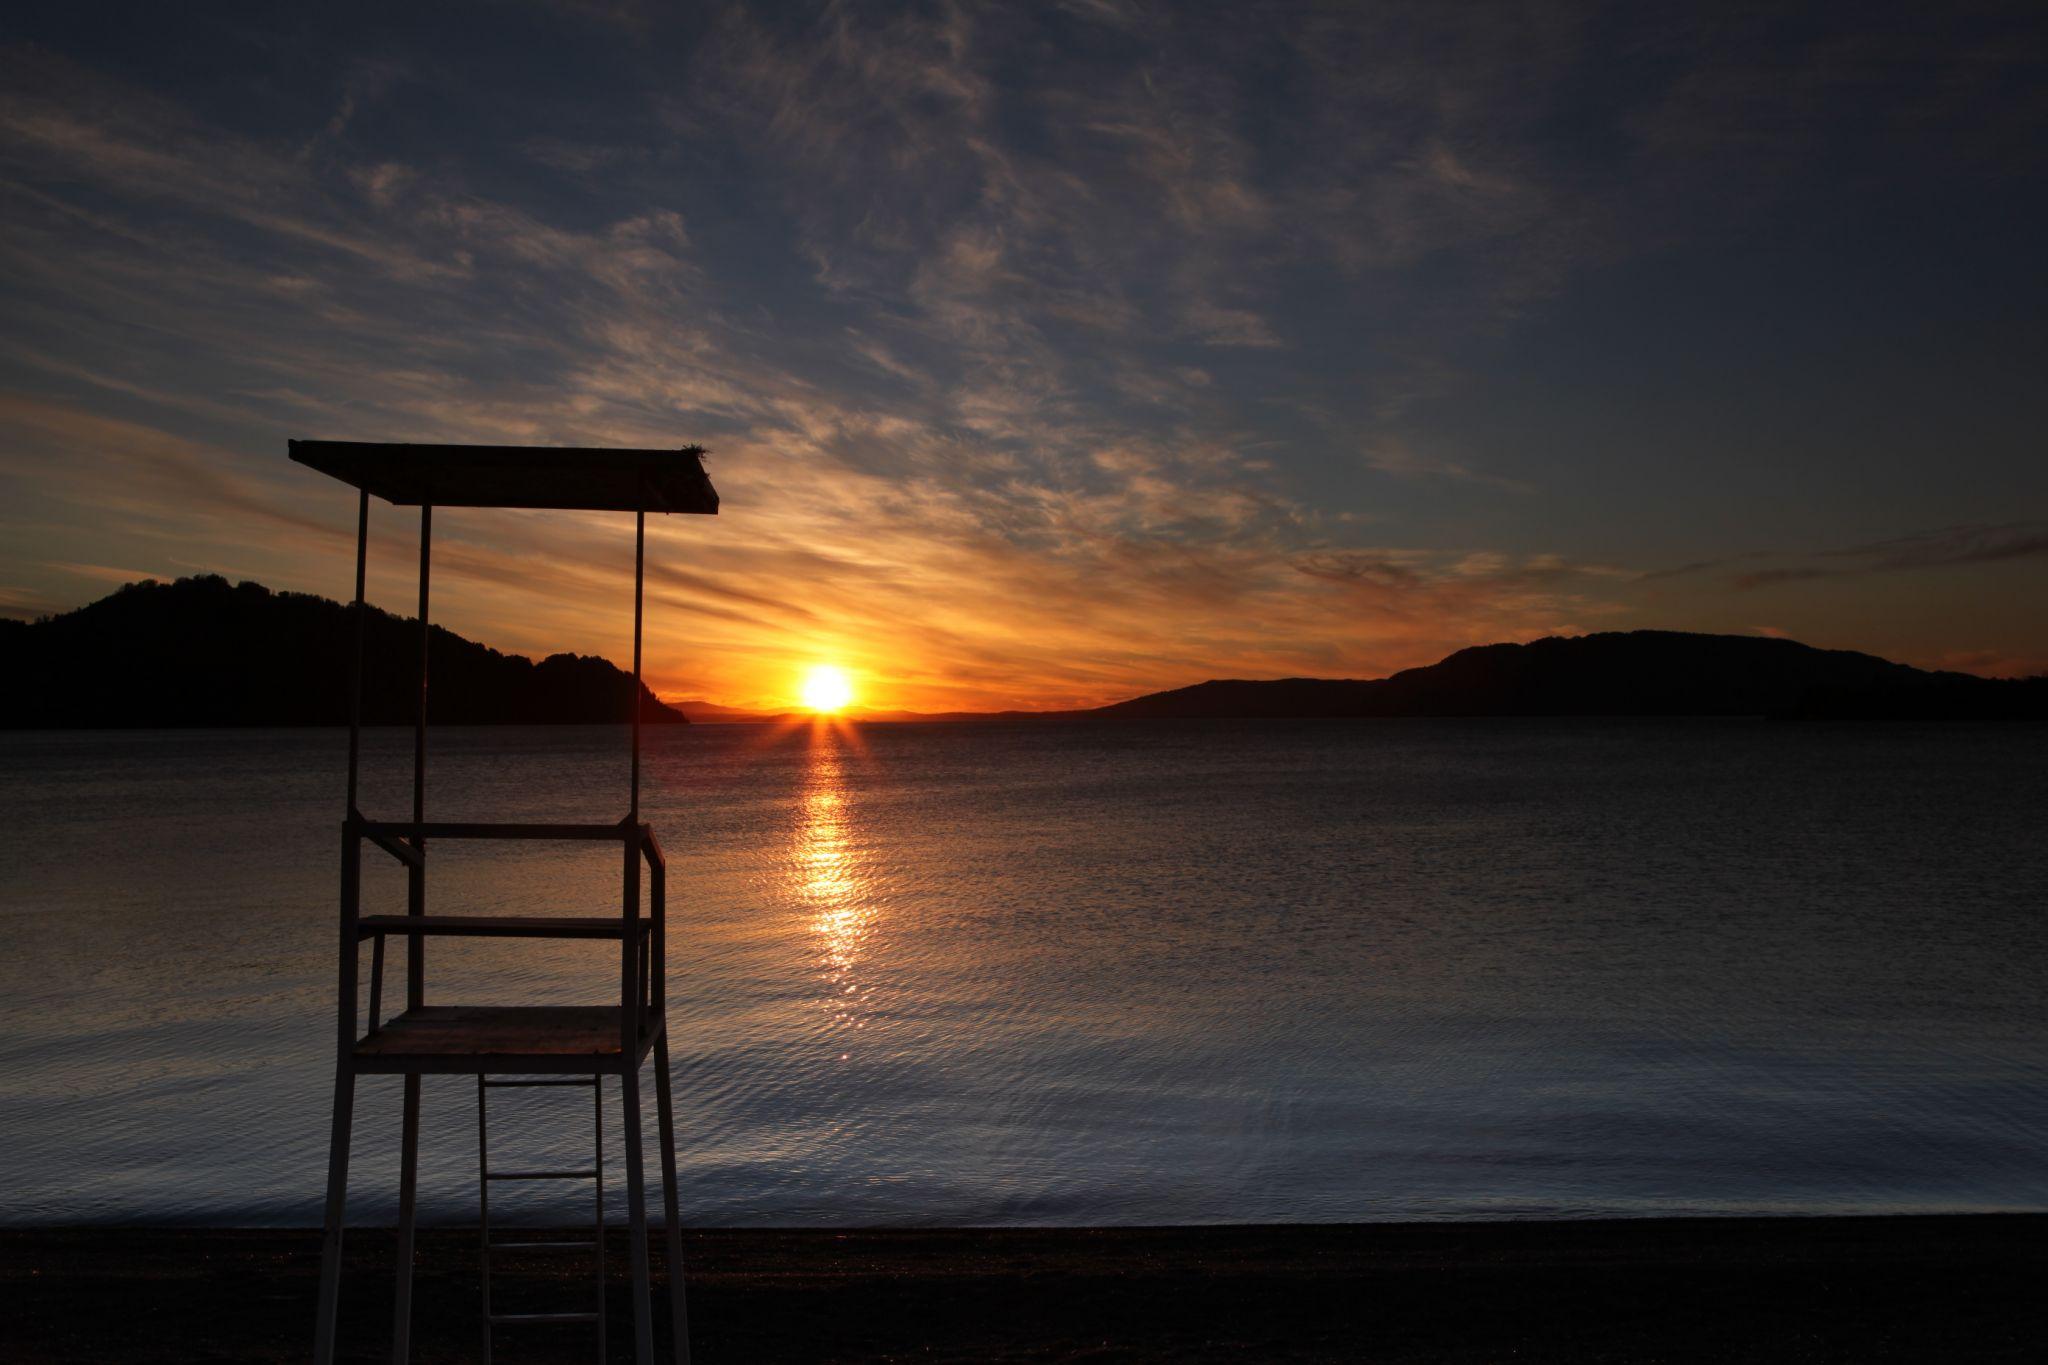 Chile, Los Rios, Lago Calafquen, Chile